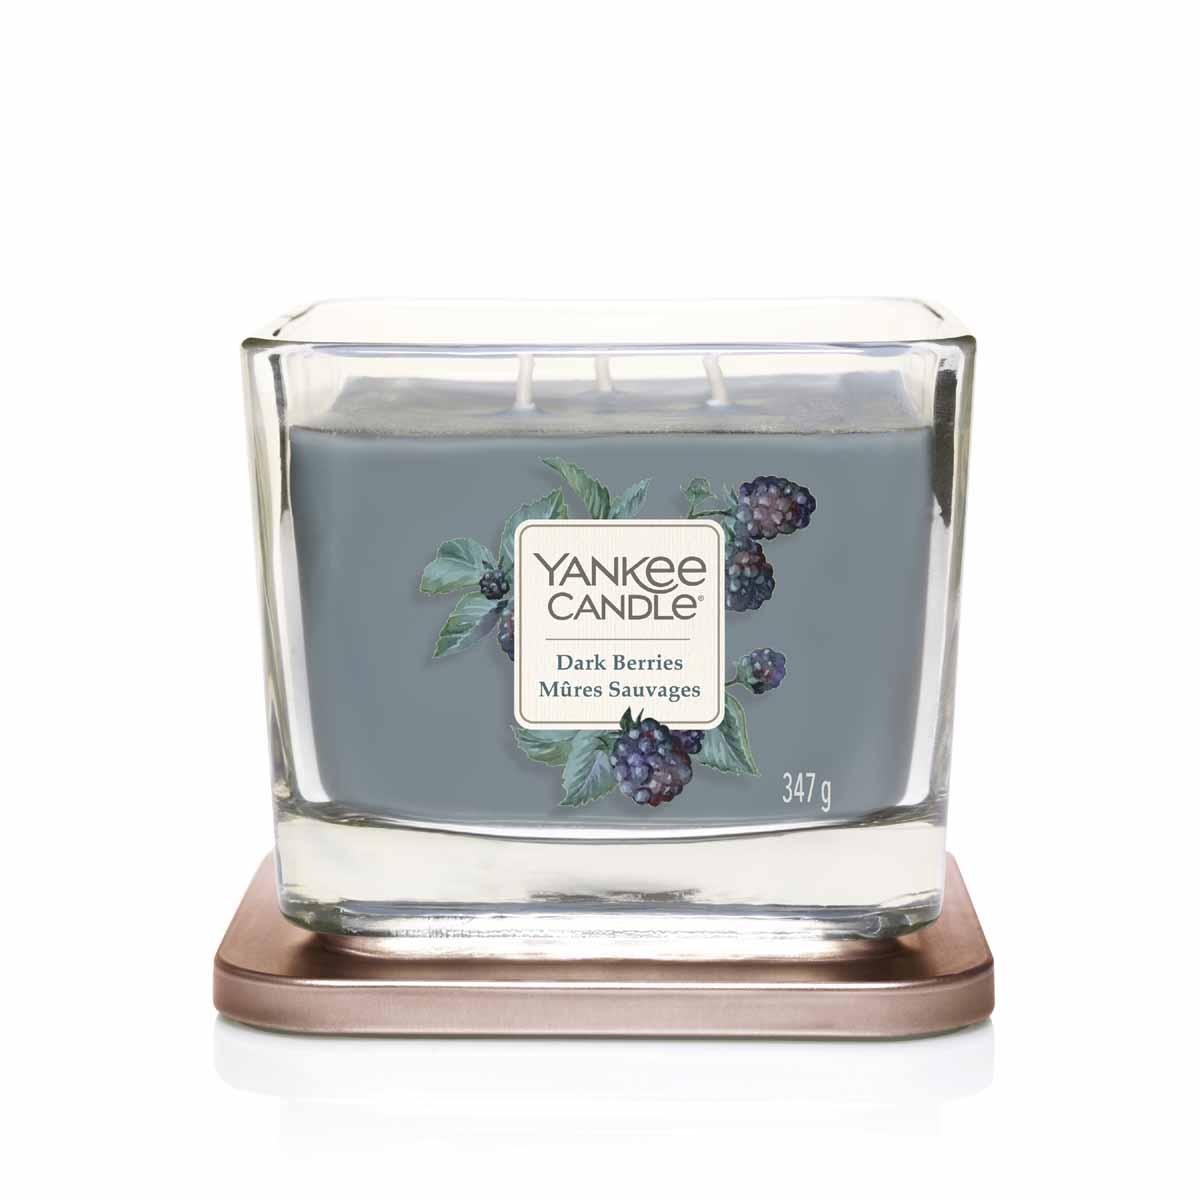 Yankee Candle Dark Berries Giara Media